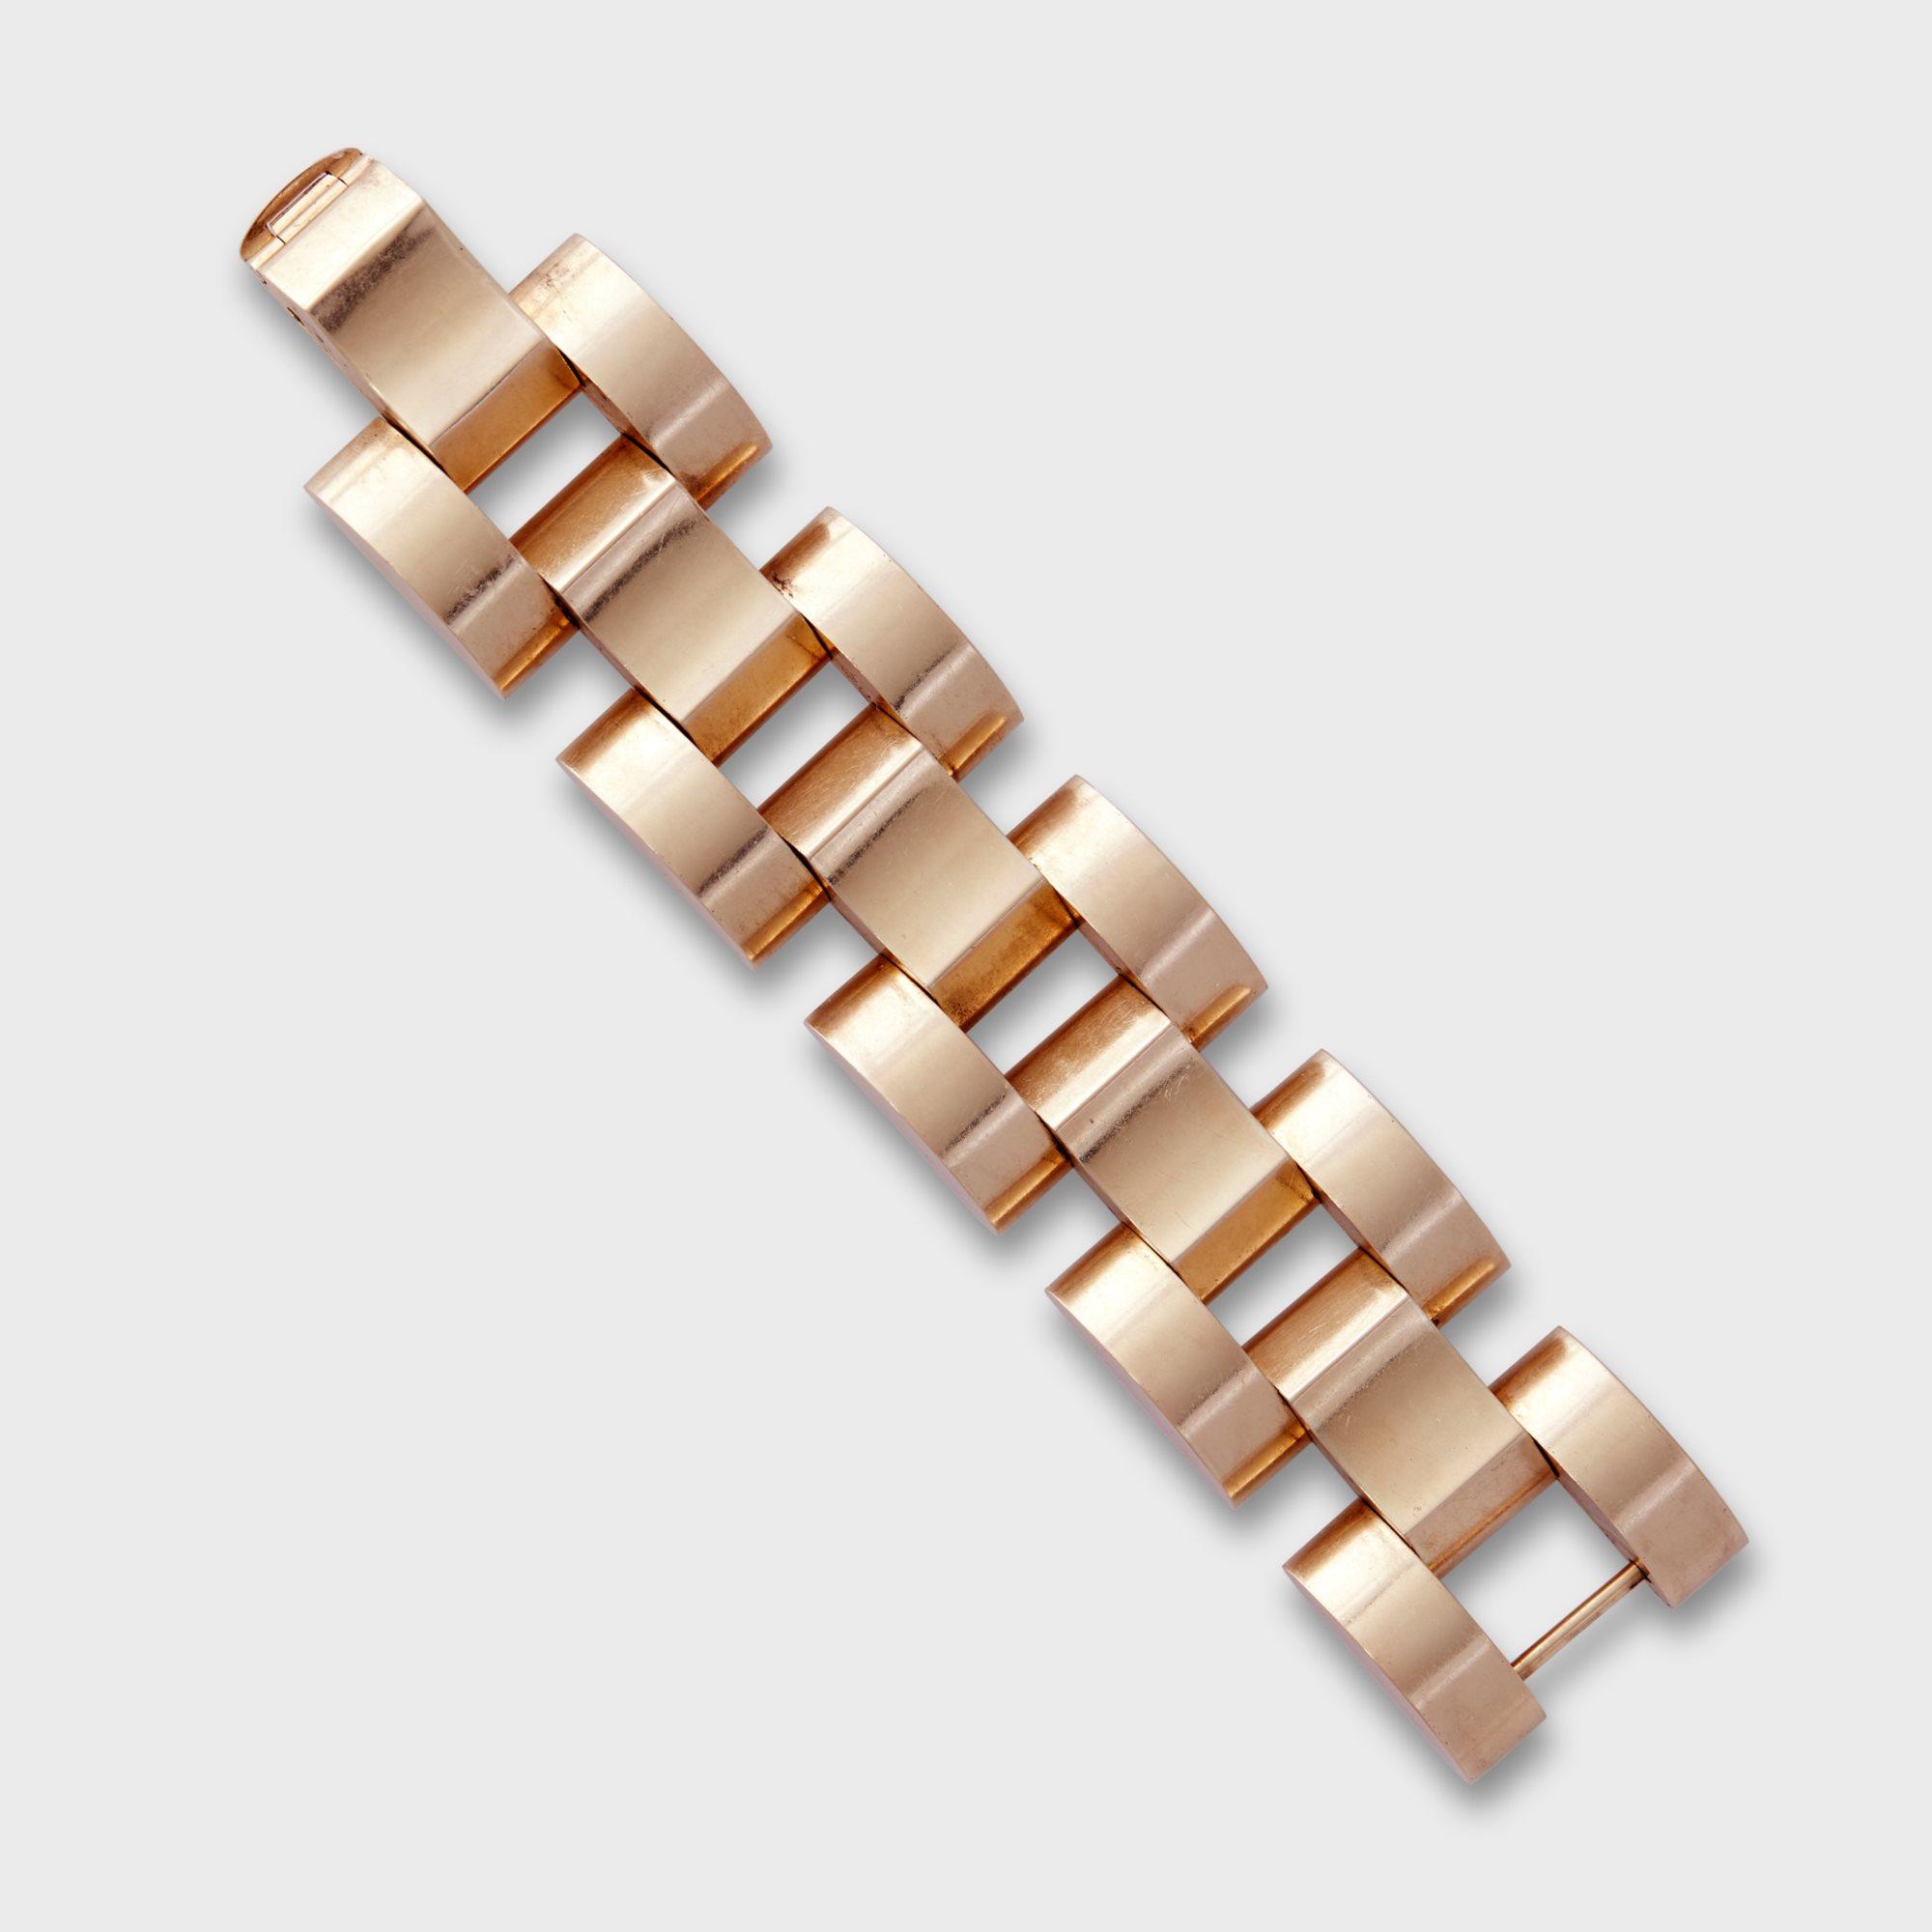 Lot 132   A fourteen karat gold 'Tank Track' strap bracelet, Ca. 1940